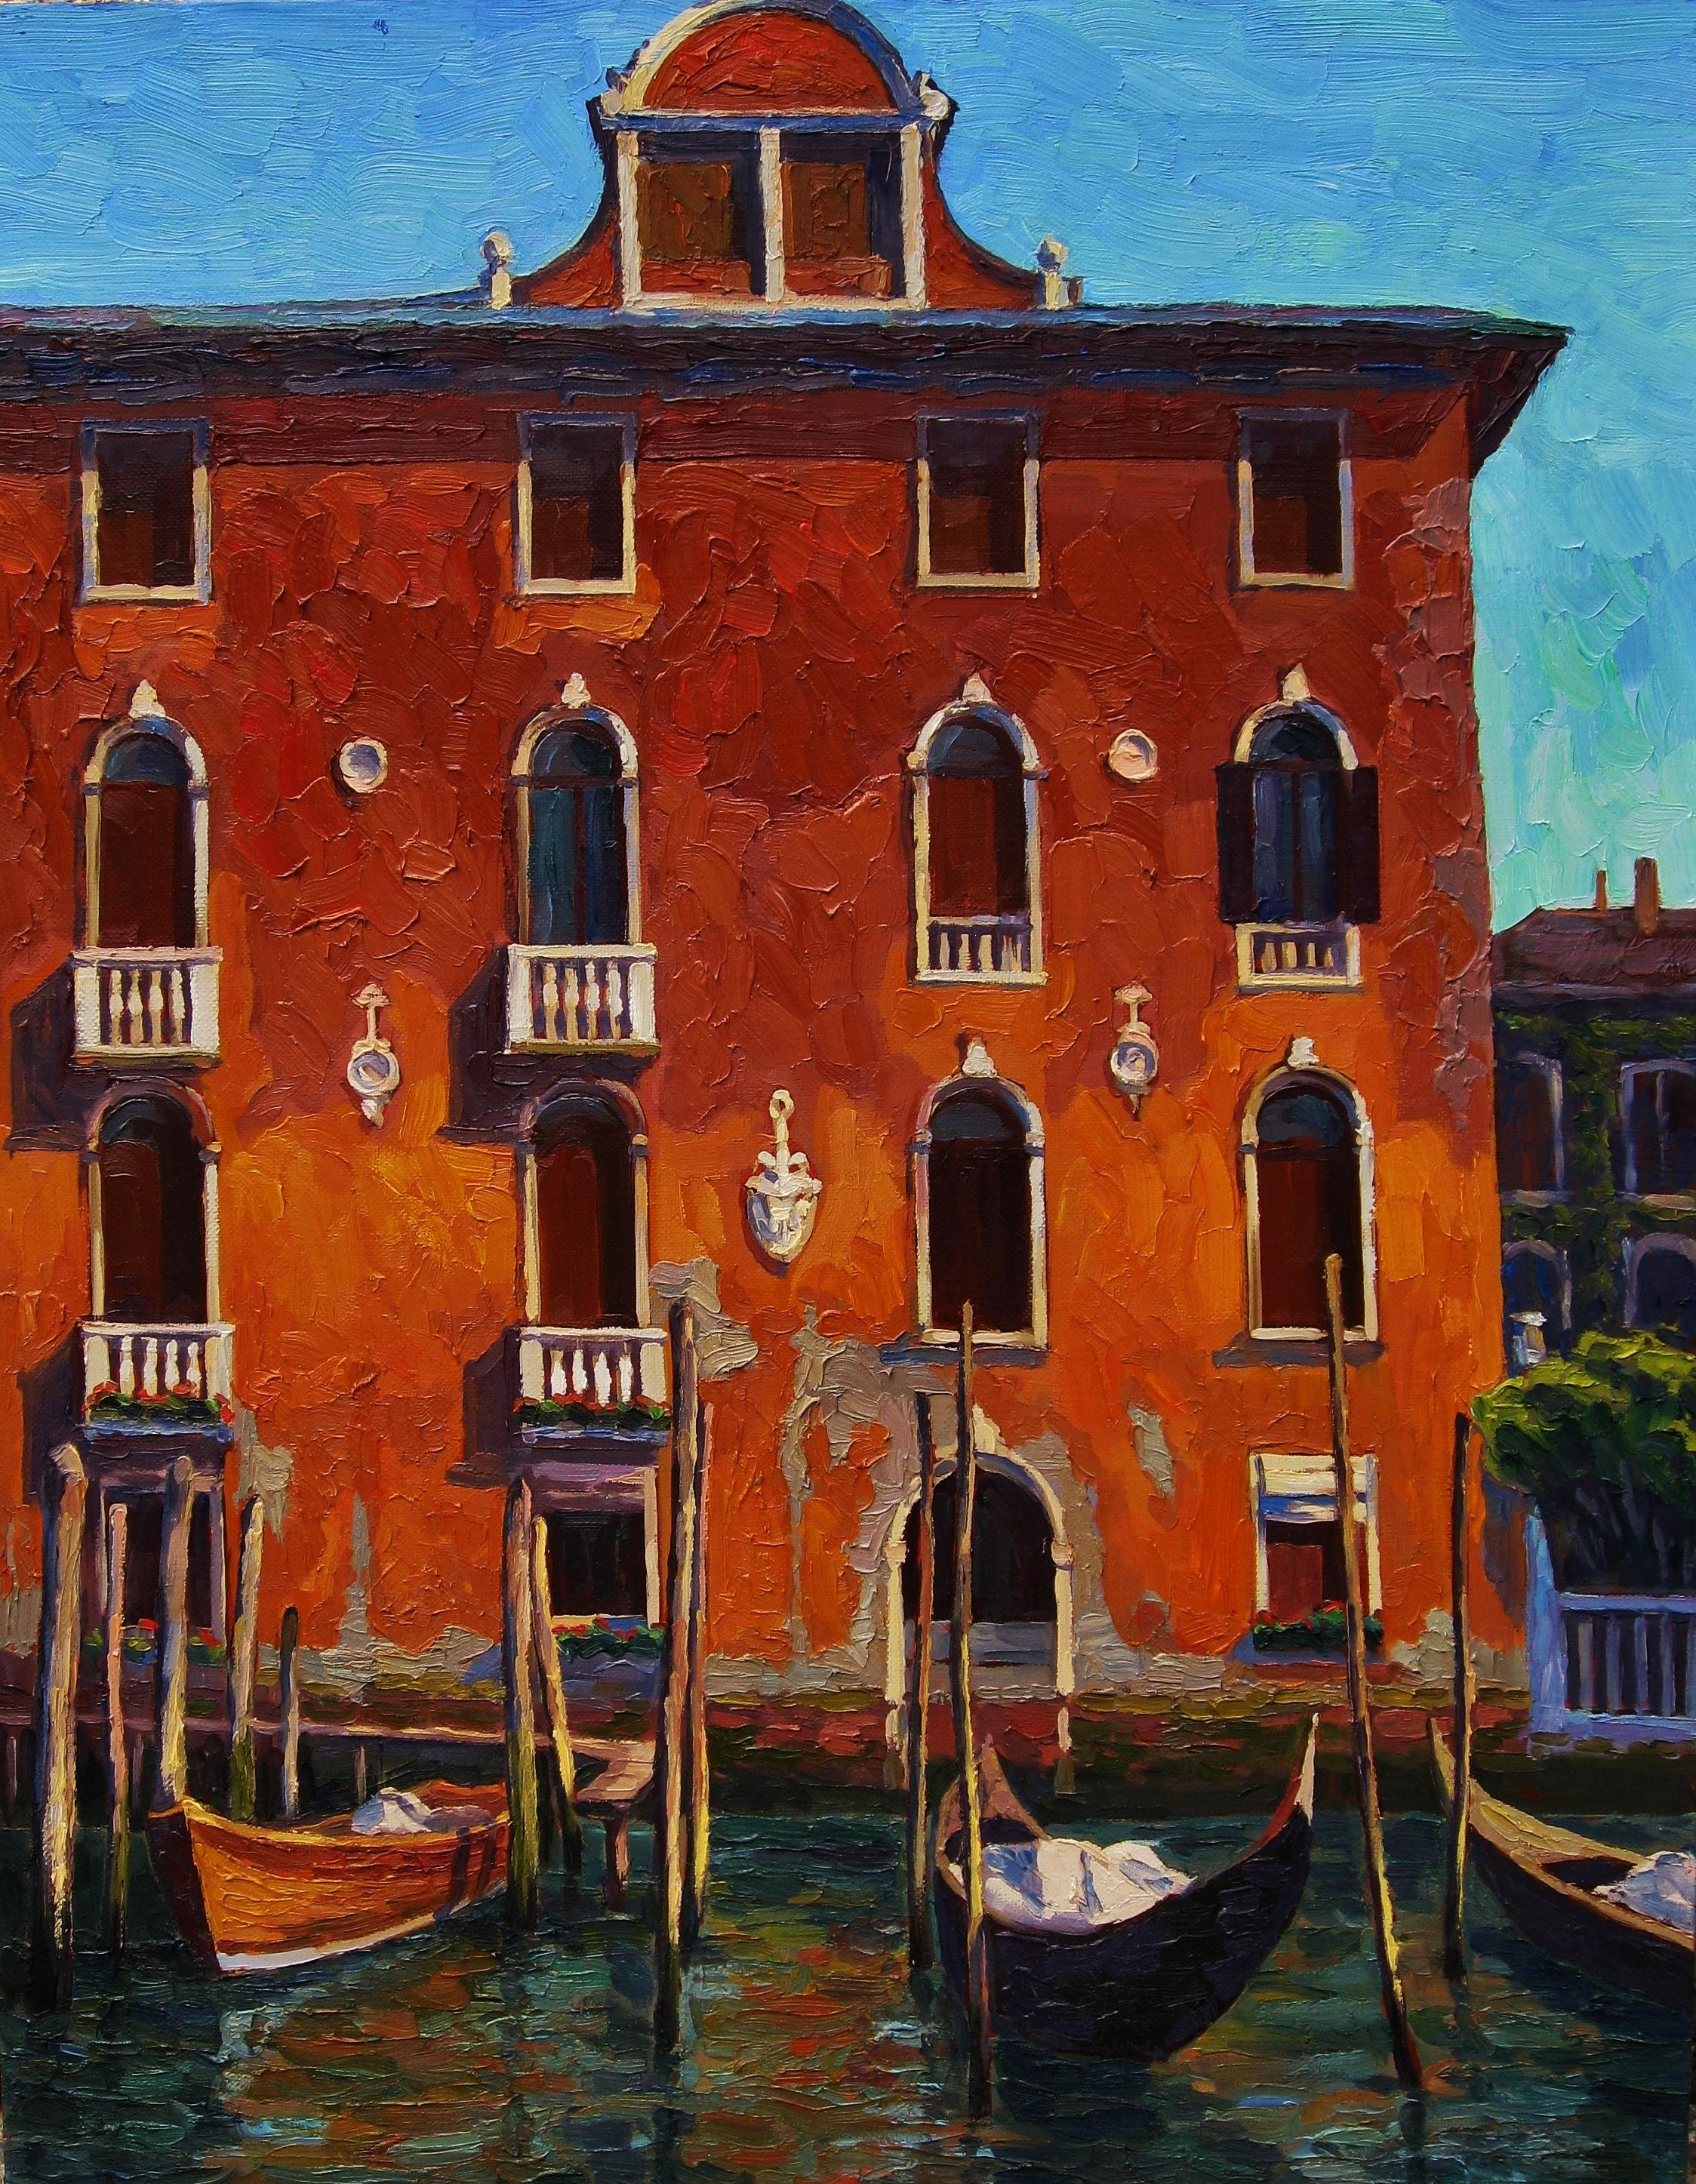 29. Старый дом в Венеции 70х90см-х.м